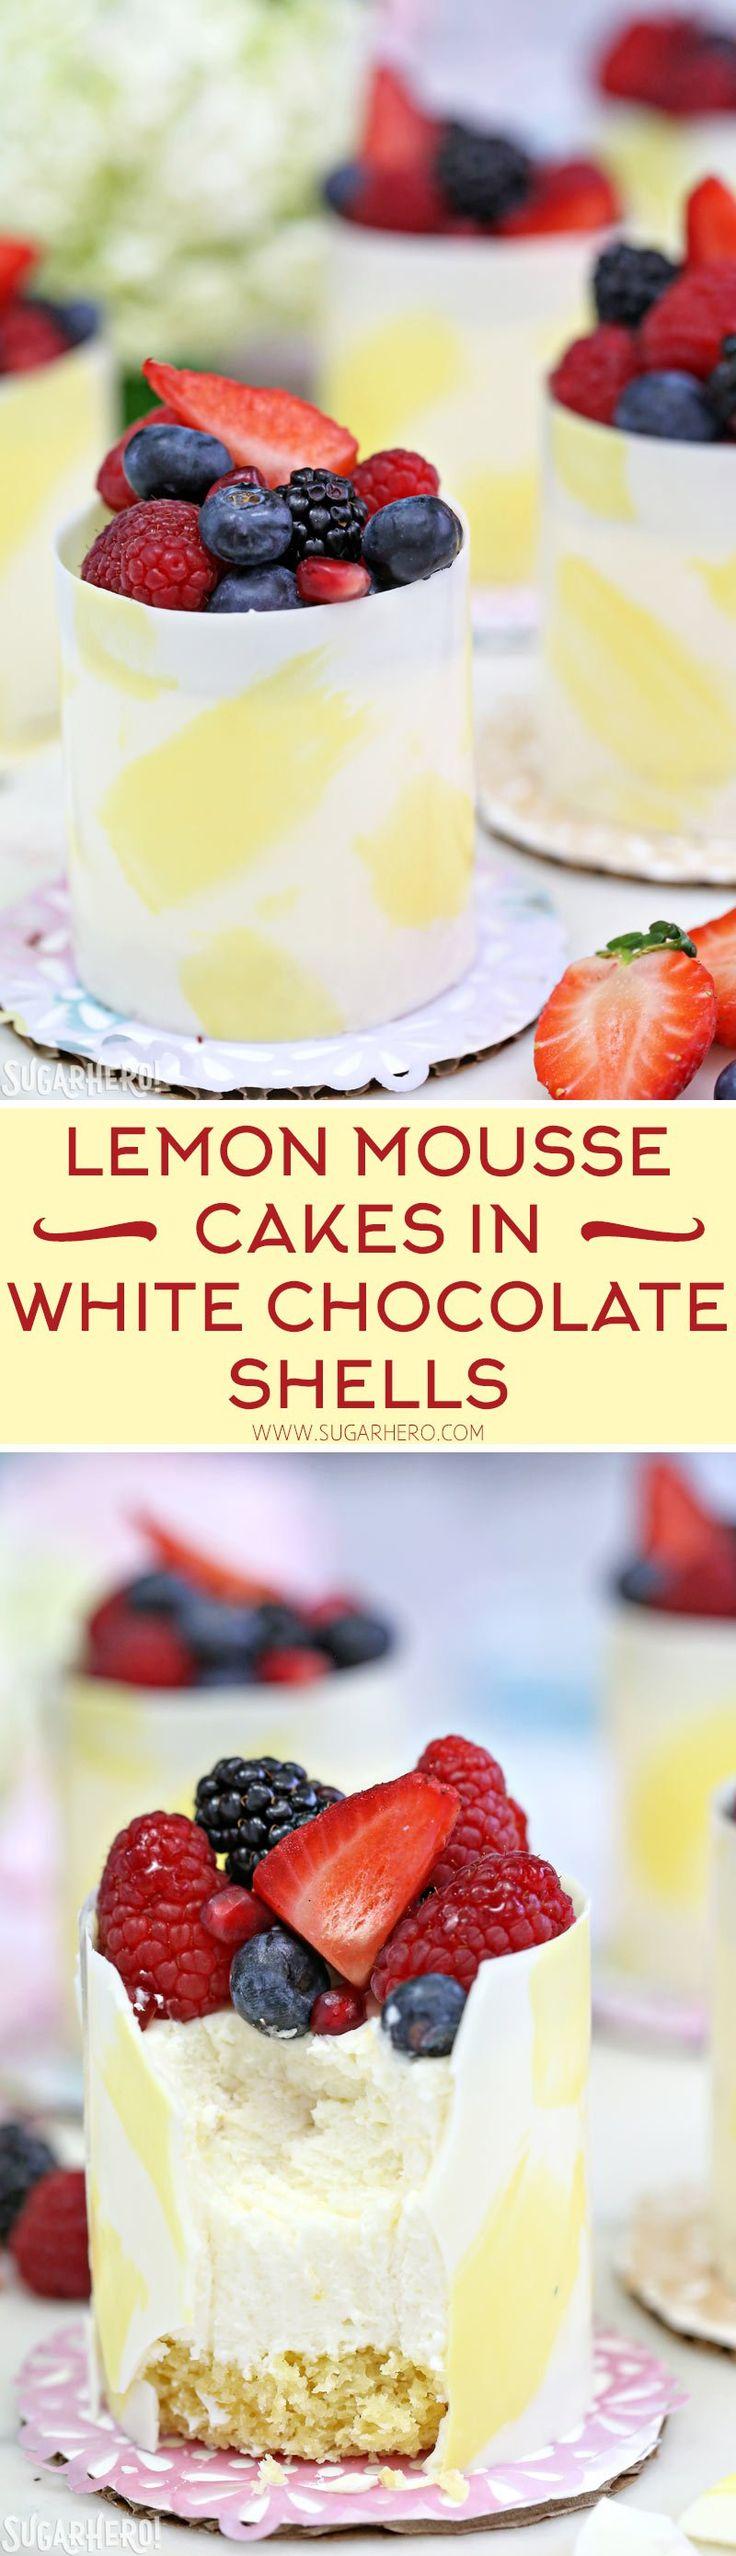 Lemon Mousse Cakes in White Chocolate Shells - lemon mousse in gorgeous painted white chocolate shells! | From SugarHero.com